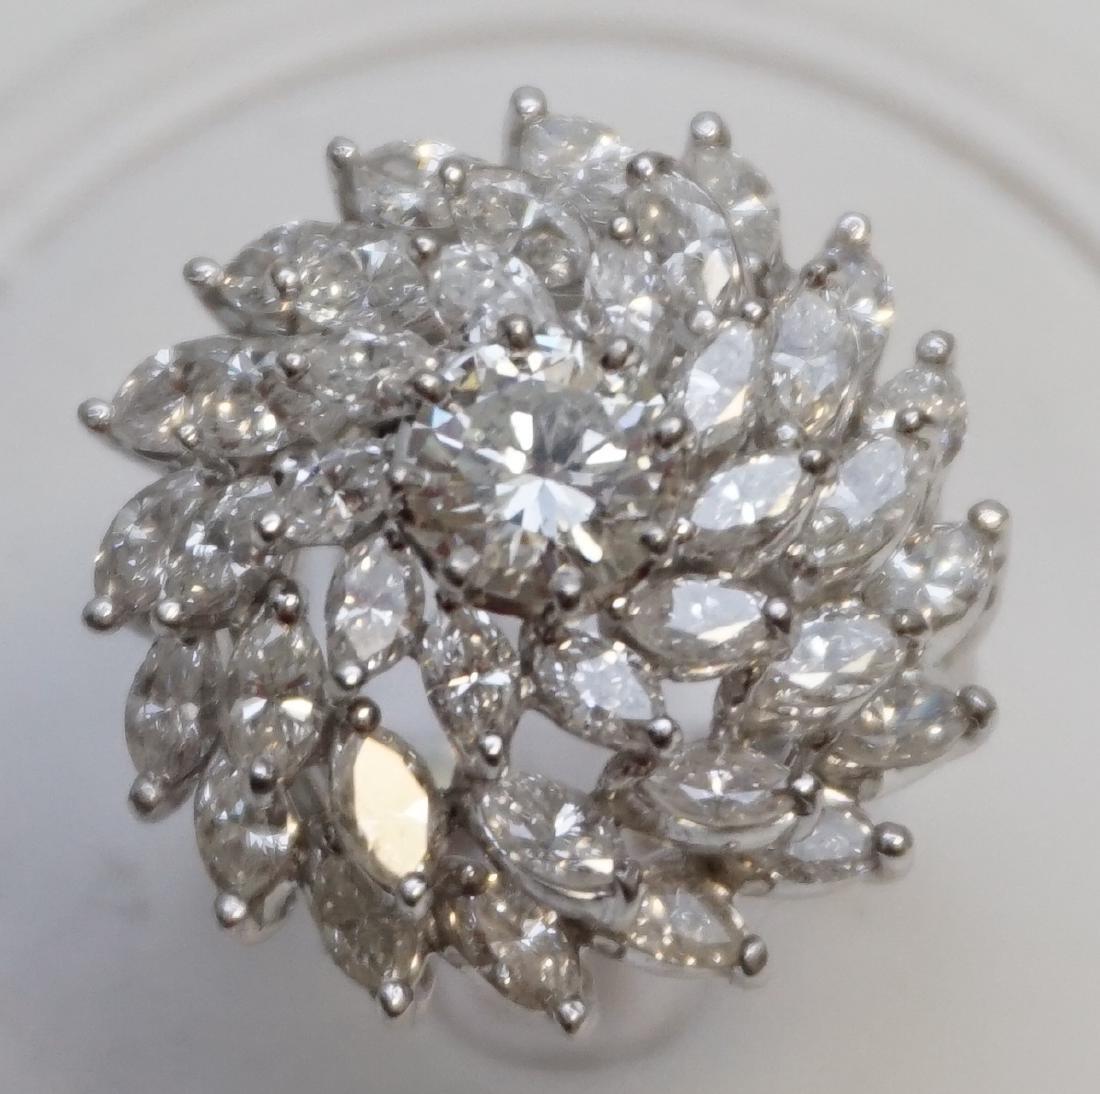 LARGE DIAMOND RING 6.95CTS - 7